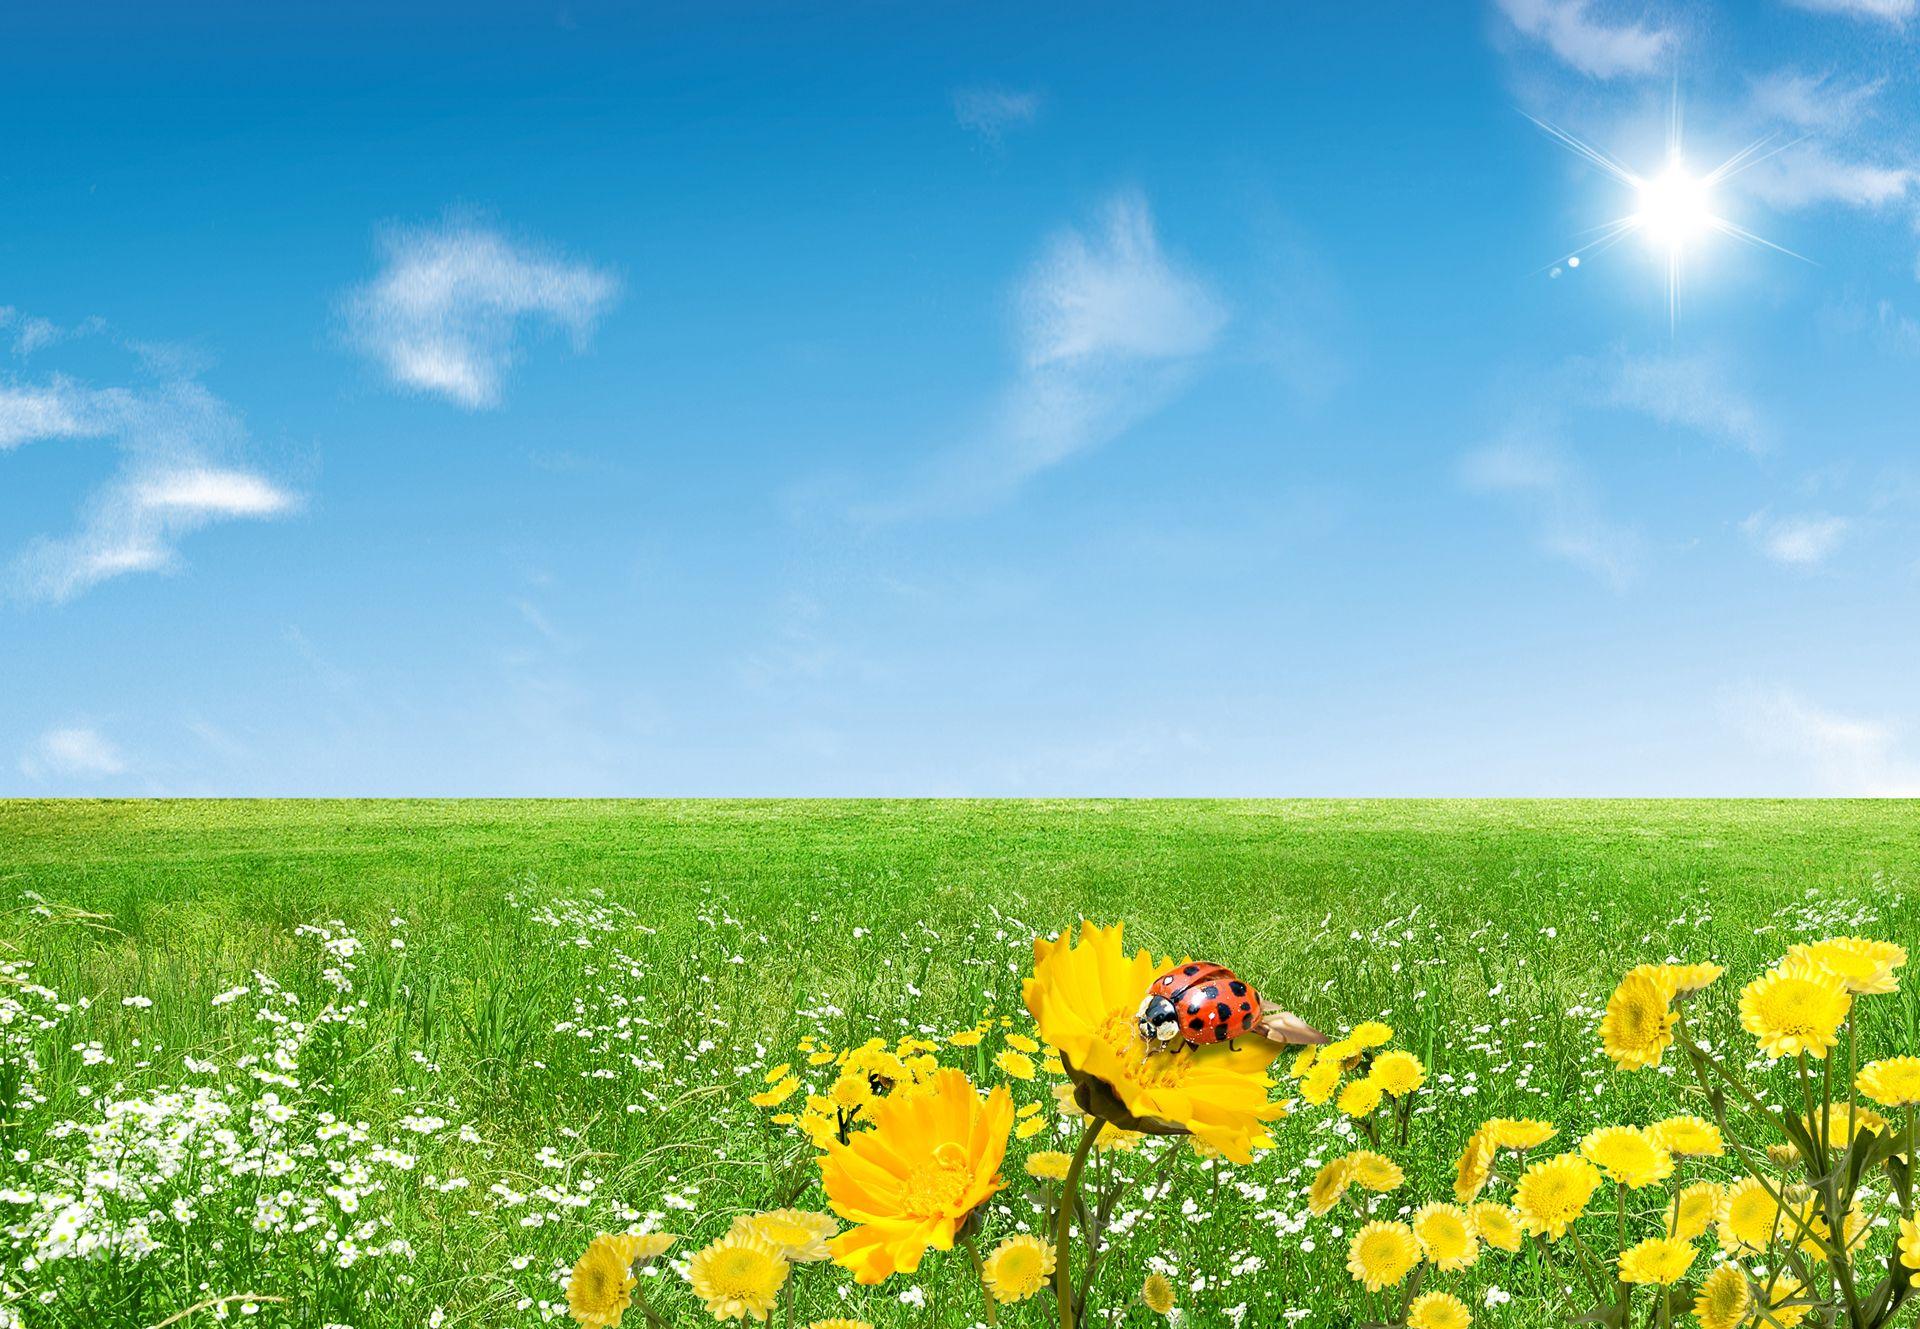 Free Spring Desktop Wallpaper In 2020 Spring Desktop Wallpaper Free Desktop Wallpaper Desktop Wallpaper